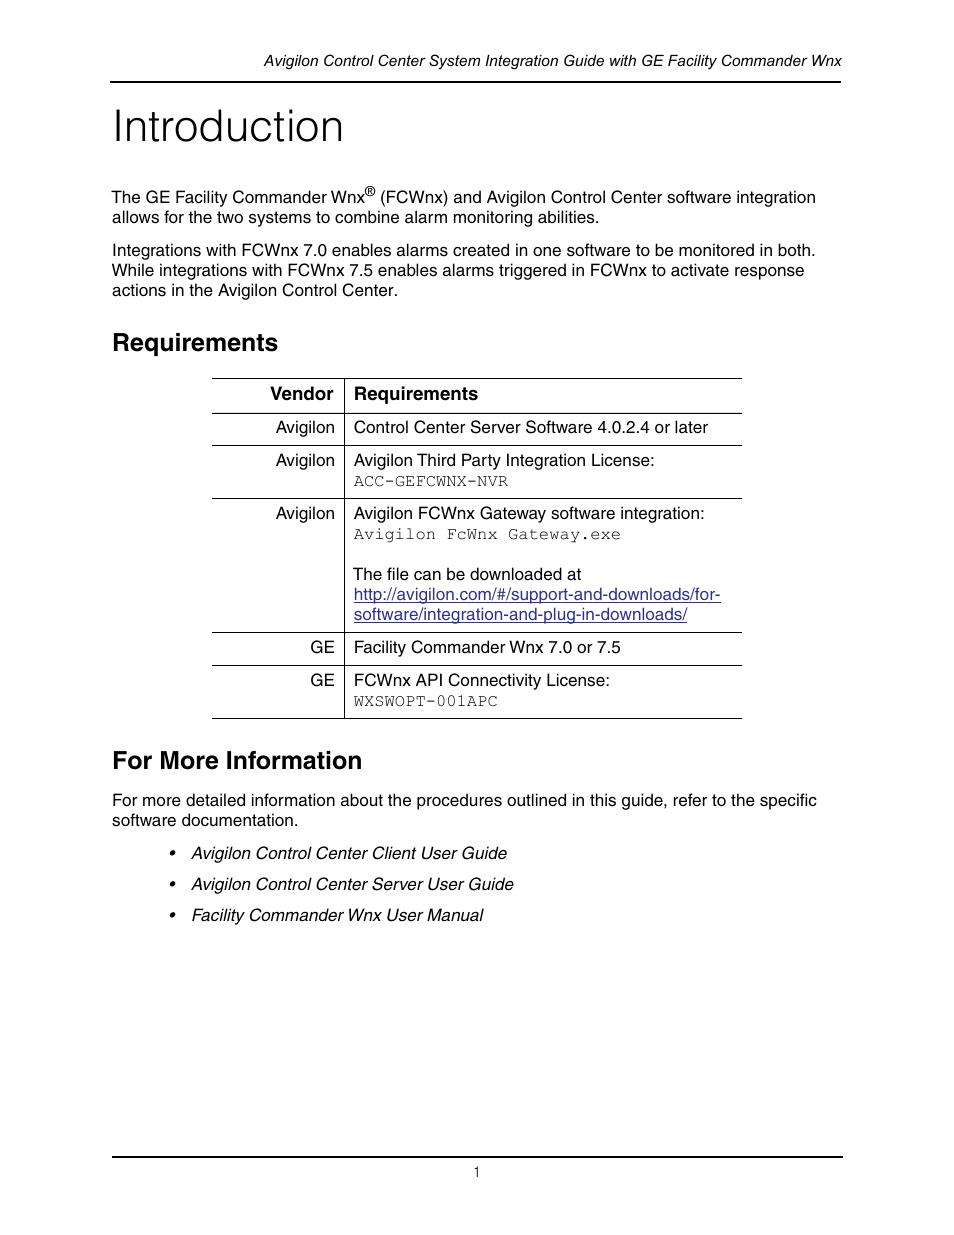 introduction requirements for more information avigilon ge rh manualsdir com Facility Commander Winx facility commander wnx 7.6 user manual